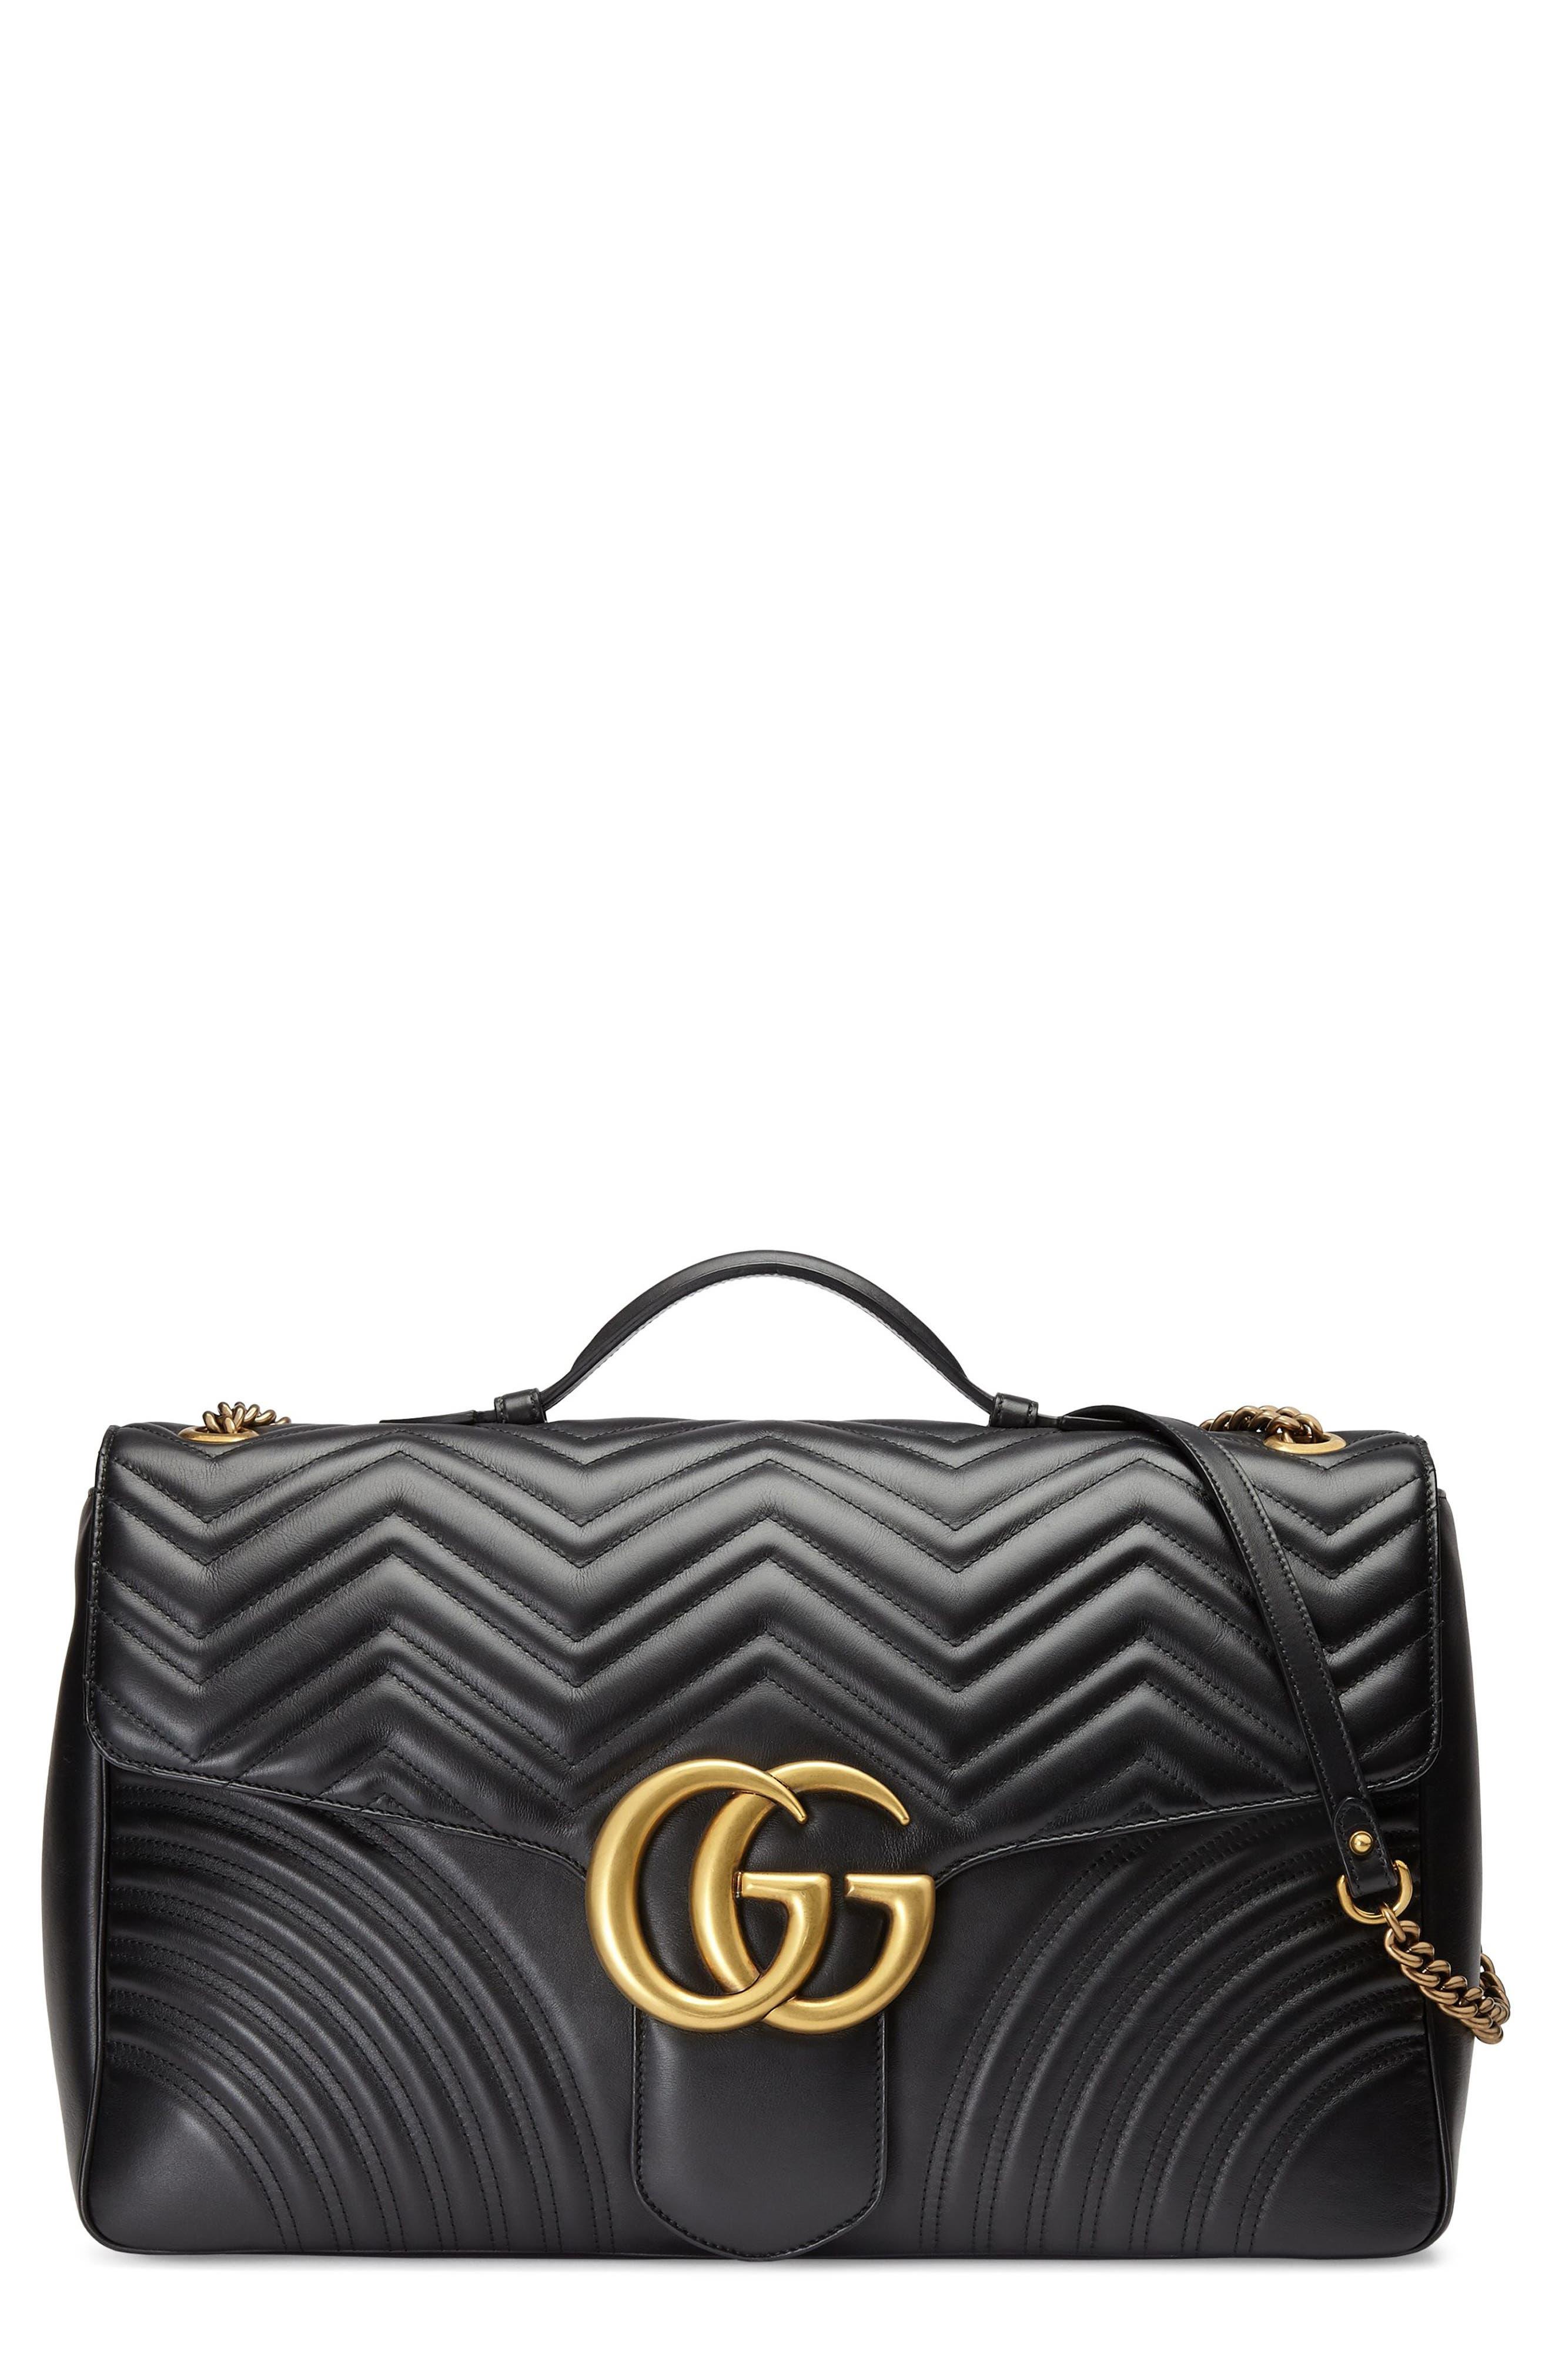 Main Image - Gucci GG Marmont Maxi Matelassé Top Handle Shoulder Bag